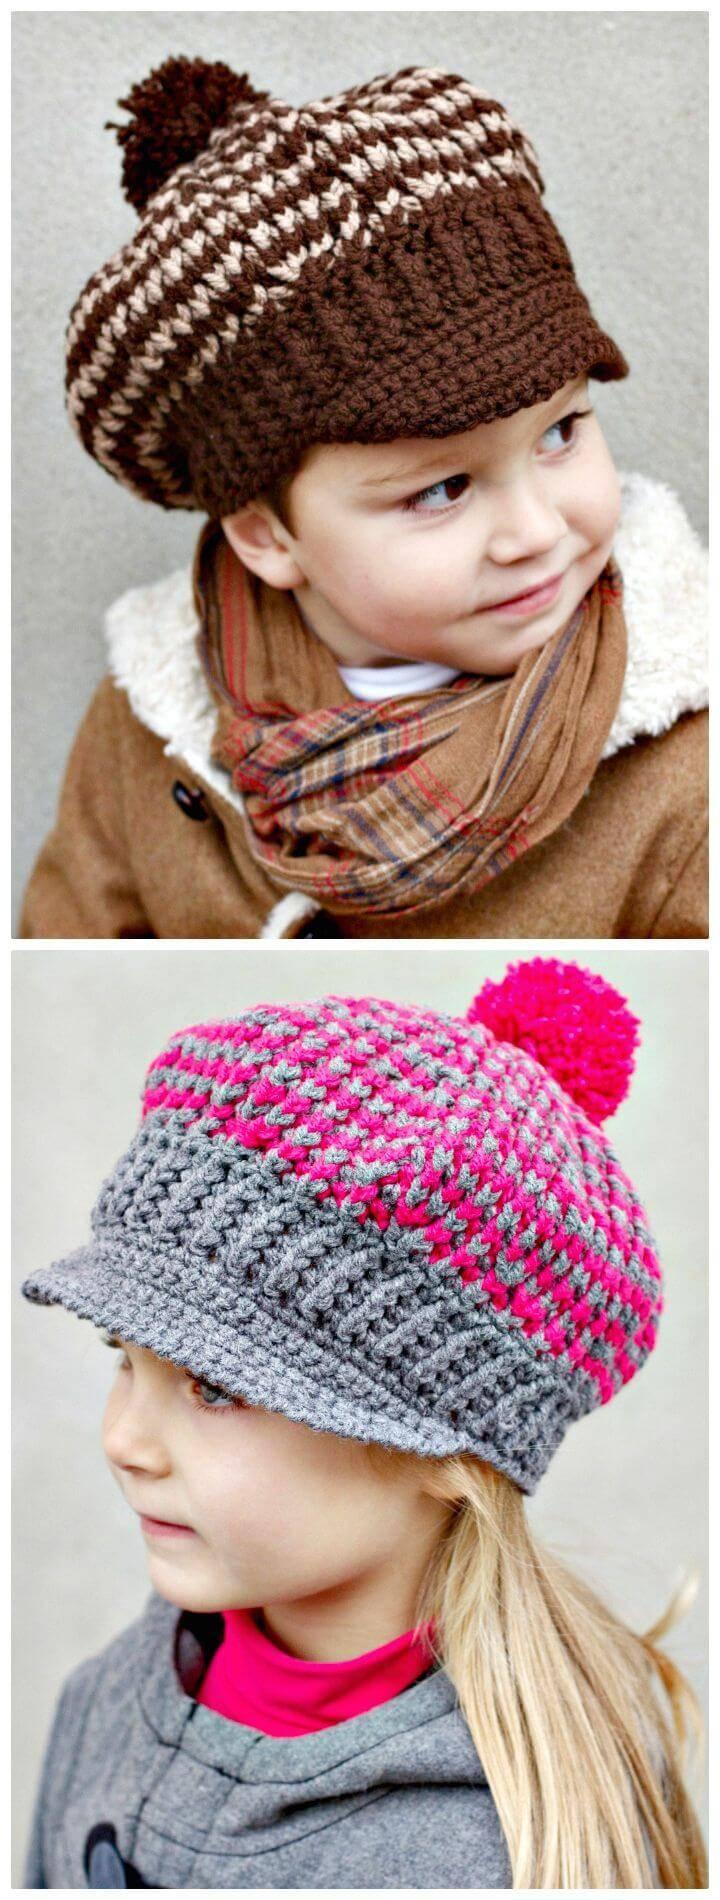 Crochet Newsboy Or Newsgirl Hat Pattern